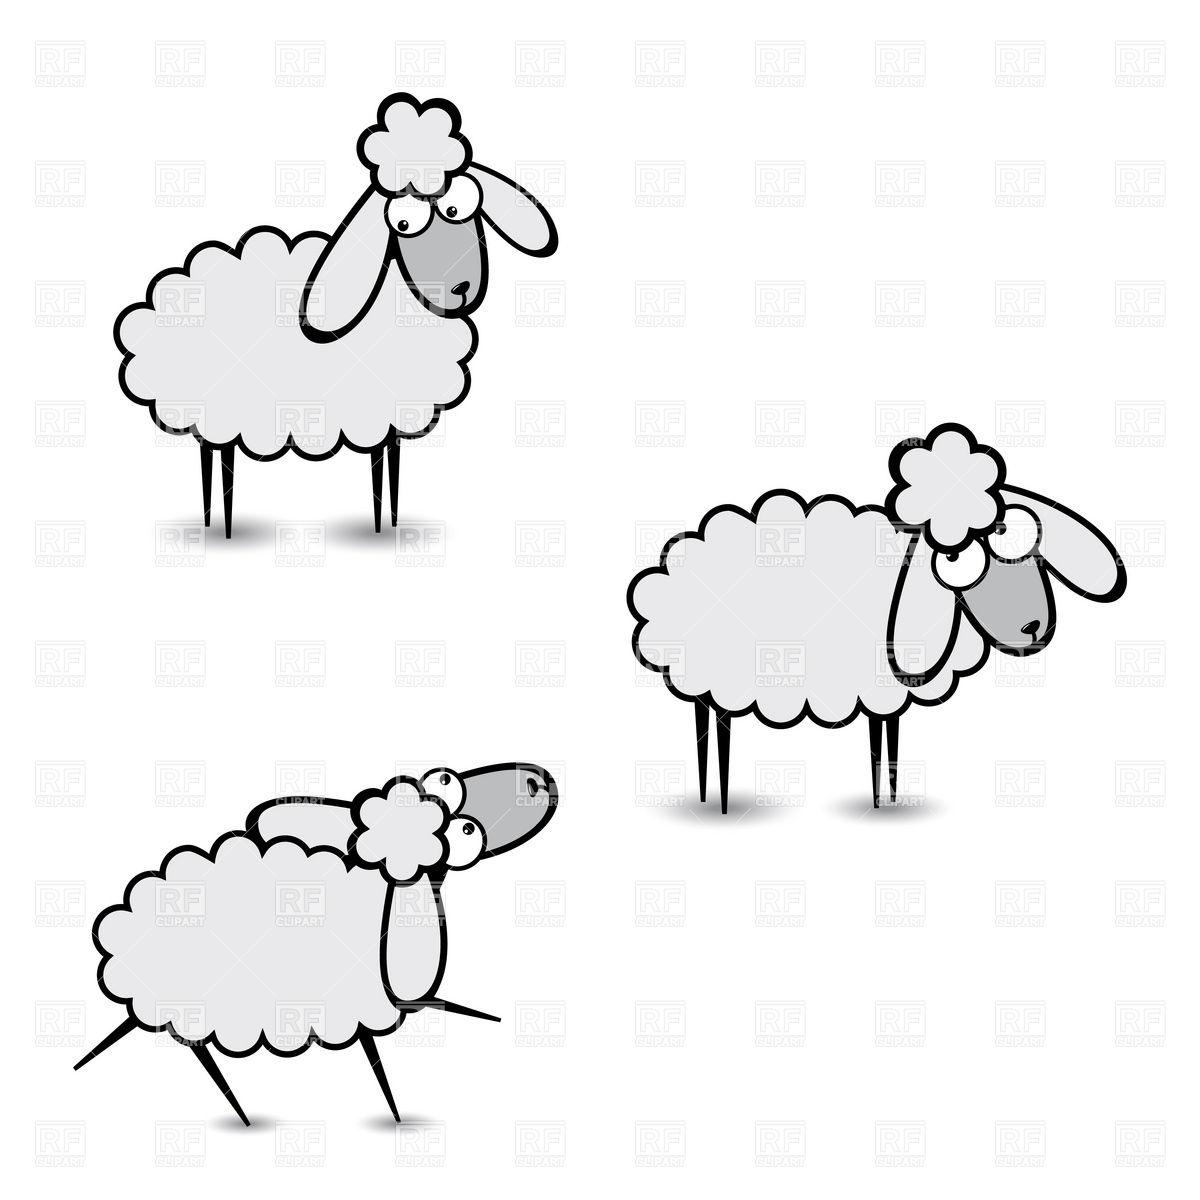 1200x1200 Funny Cartoon Sheep Character Vector Image Vector Artwork Of